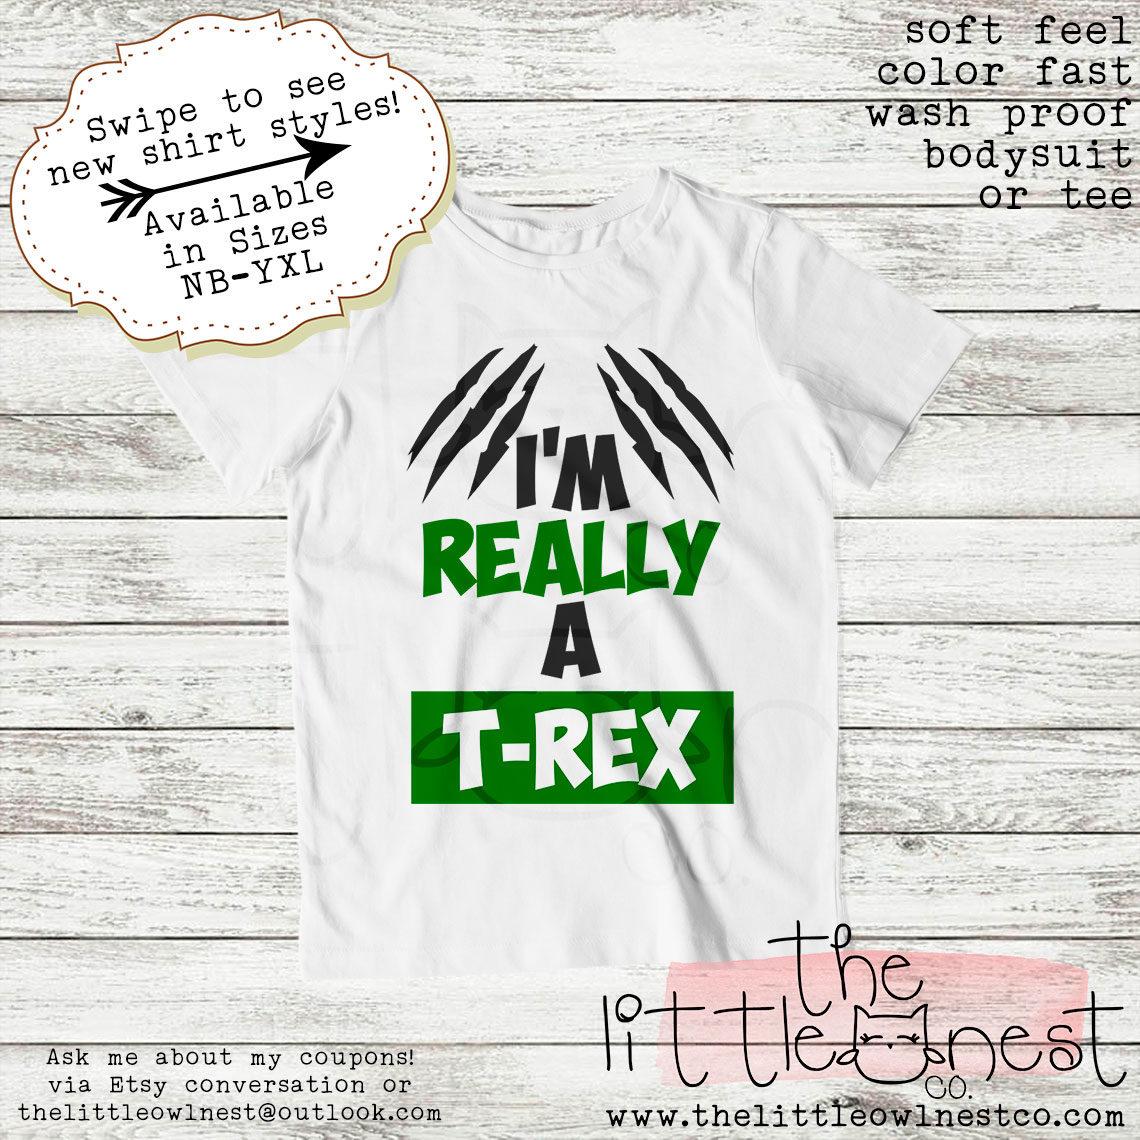 446b7c5bfe3 Toddler Boy Funny T Shirts - BCD Tofu House